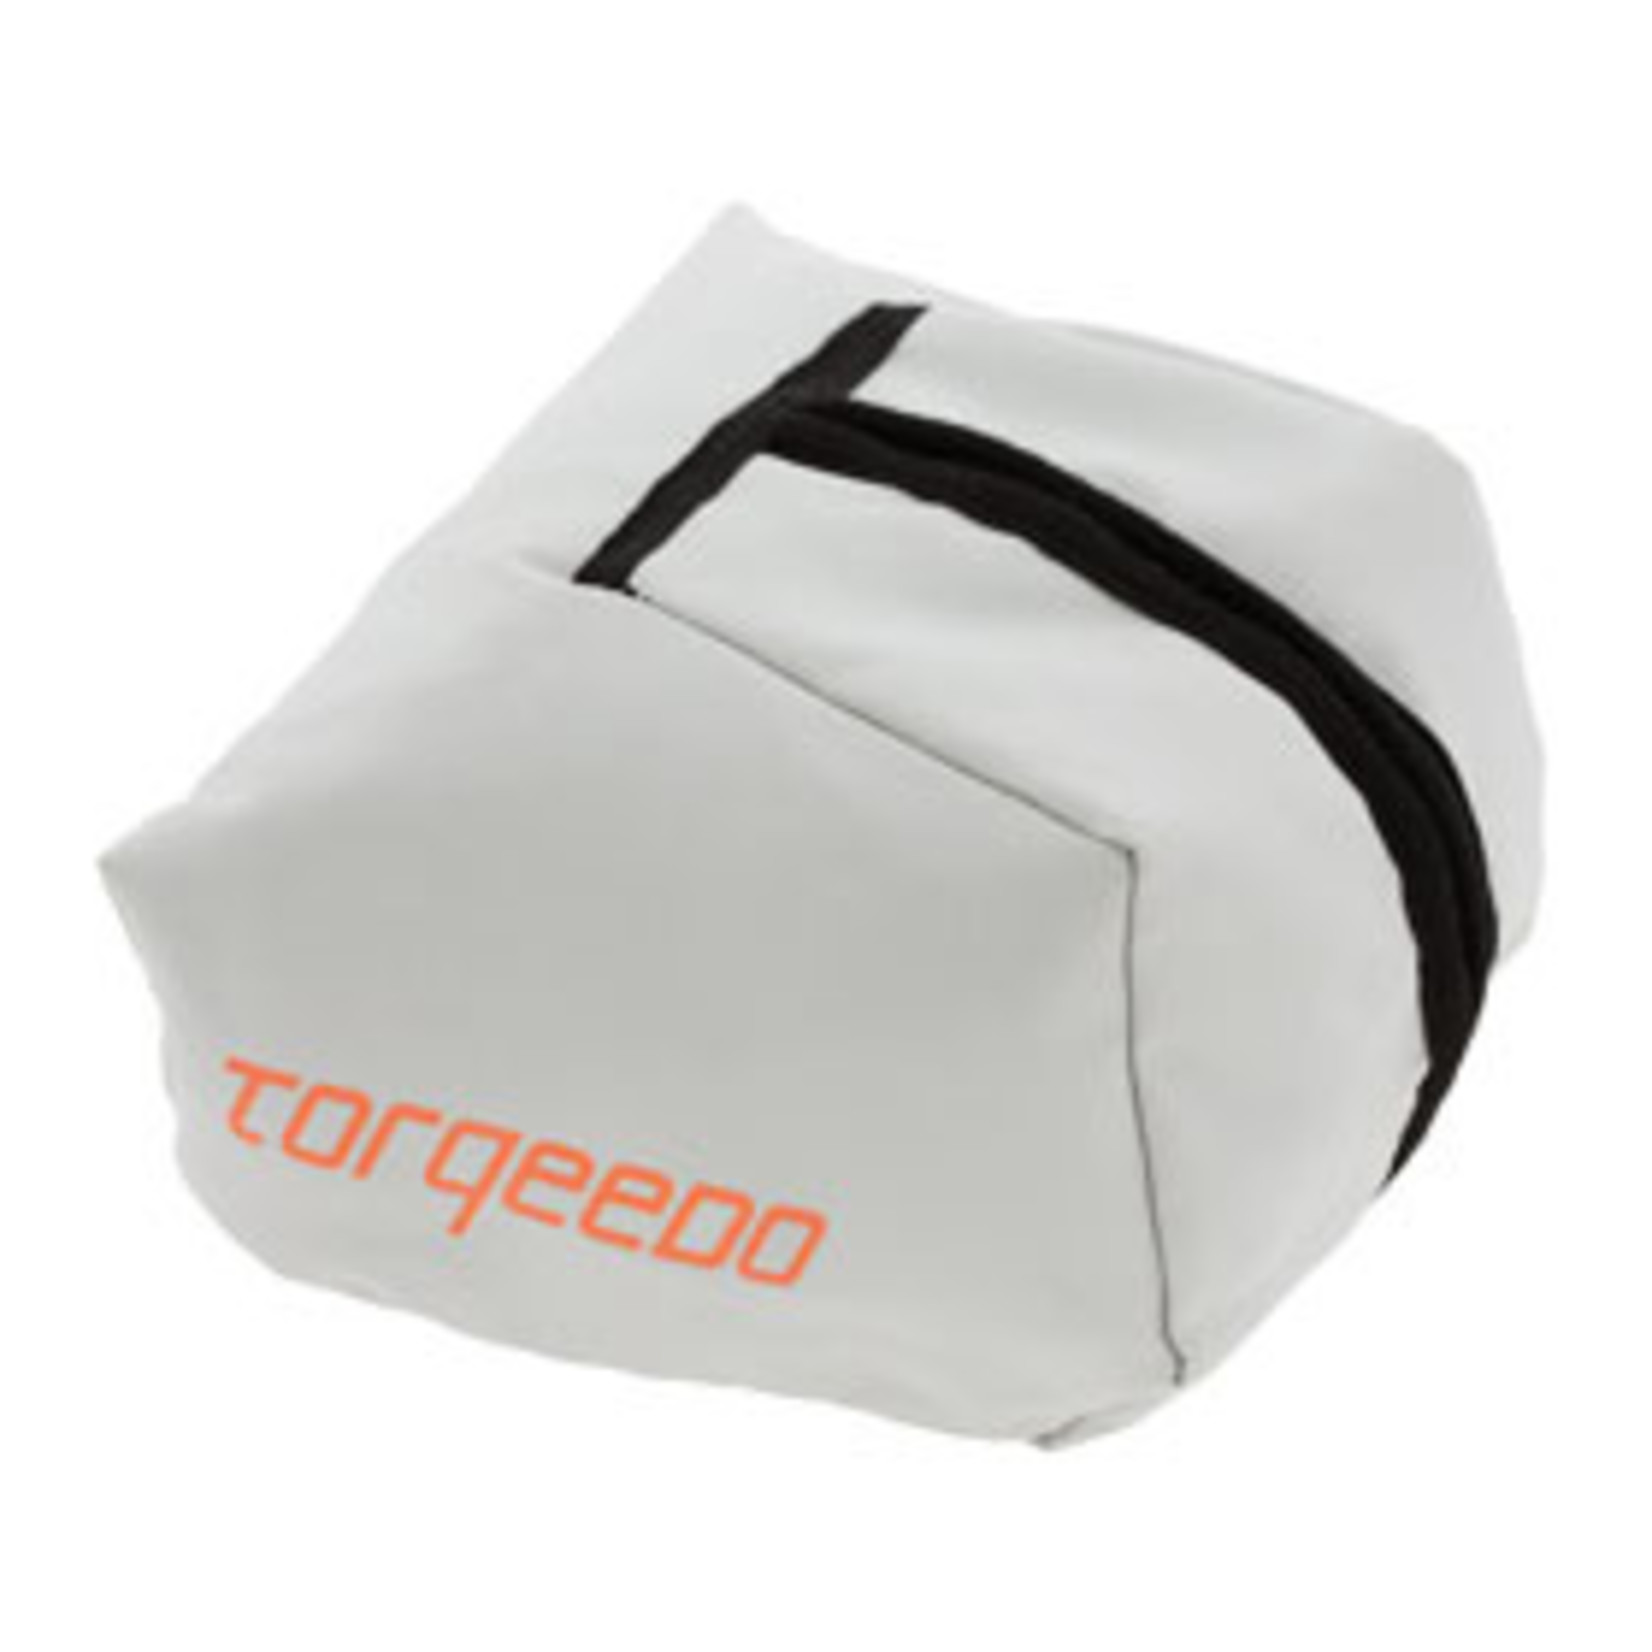 Torqeedo Torqeedo Travel engine cover - protective cover